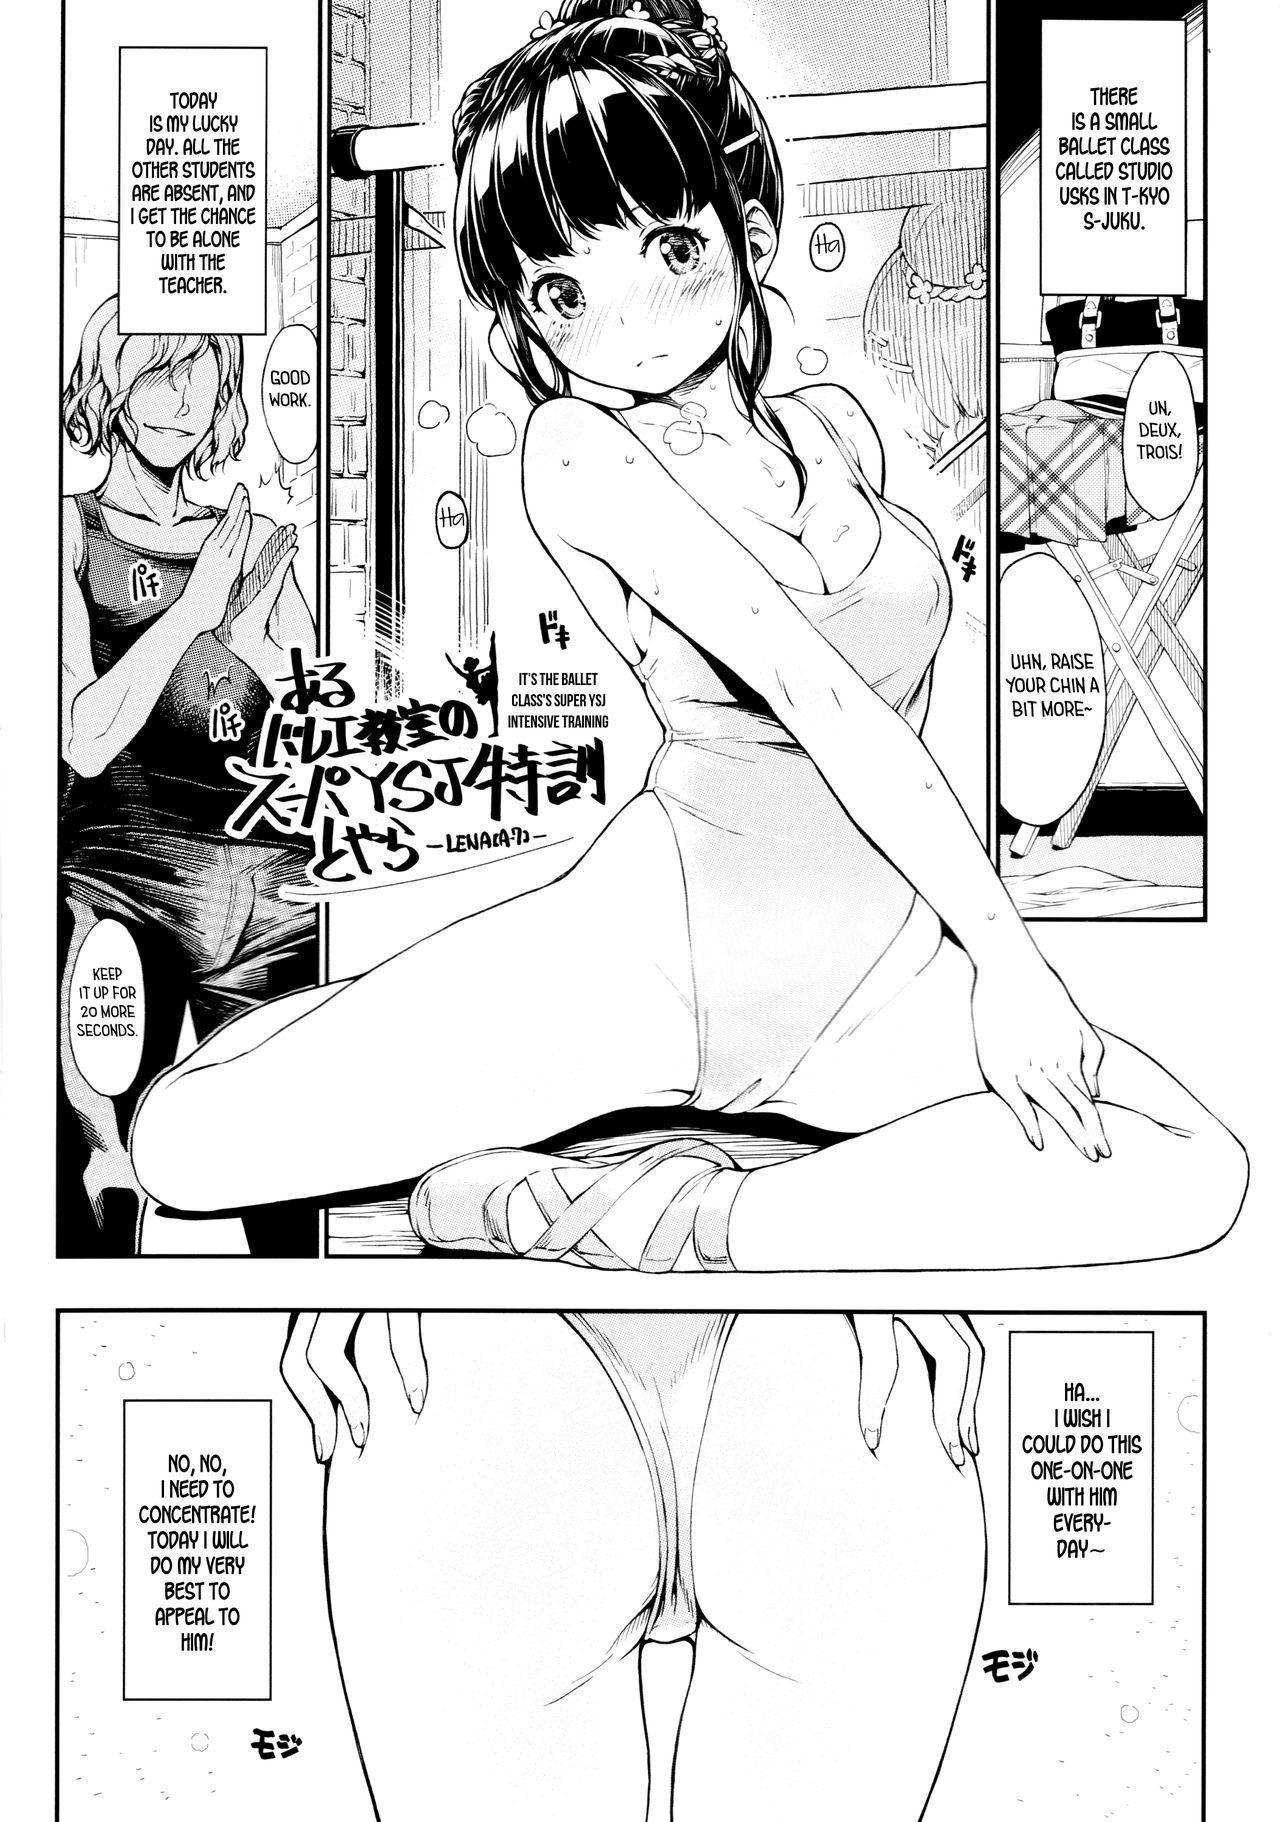 )] aru ballet kyoushitsu no super YSJ tokkun to yara | It's the ballet class's super YSJ training 2